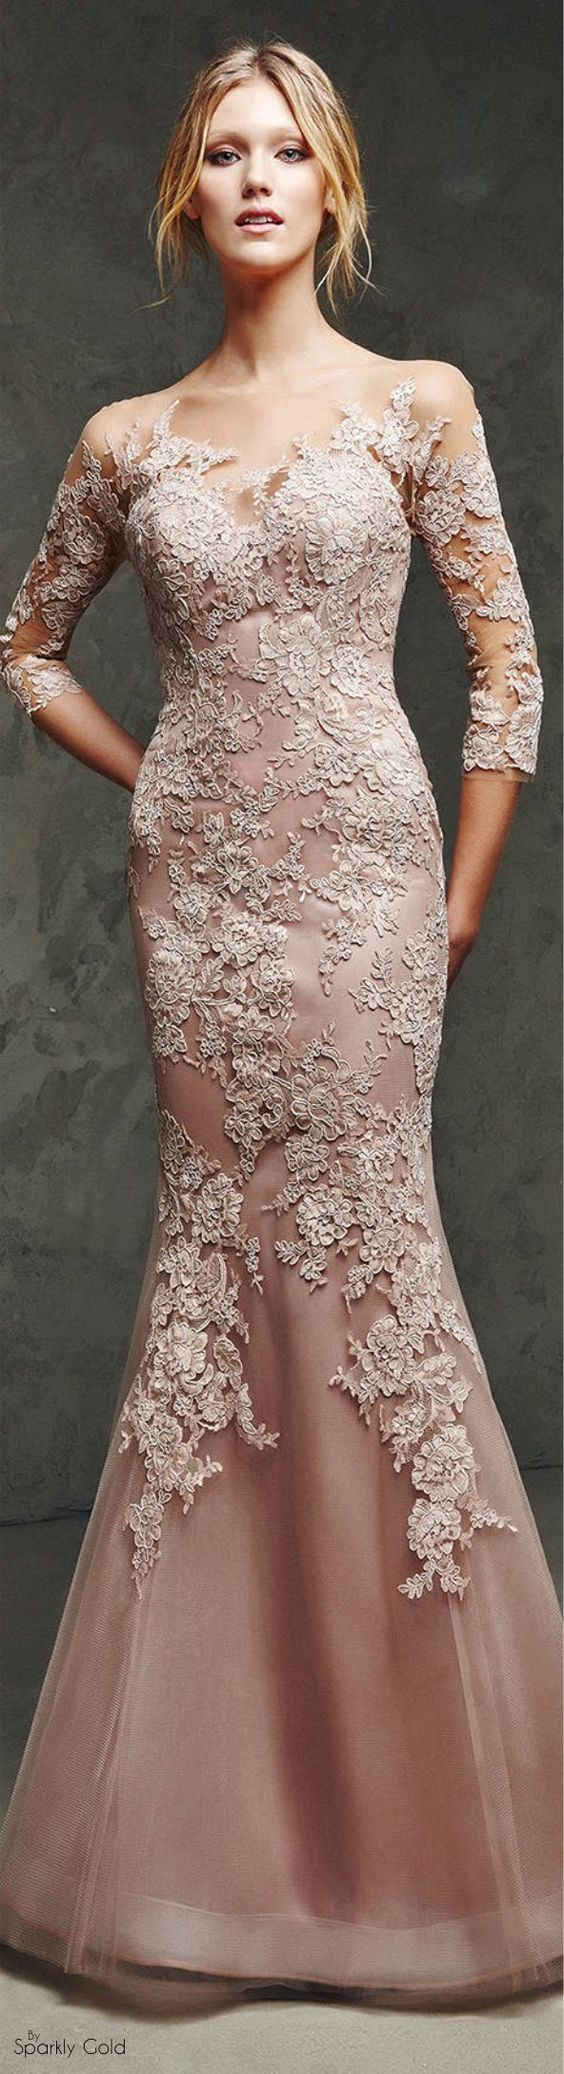 Pronovias 2016 lace maxi dress women fashion outfit clothing style apparel @roressclothes closet ideas: